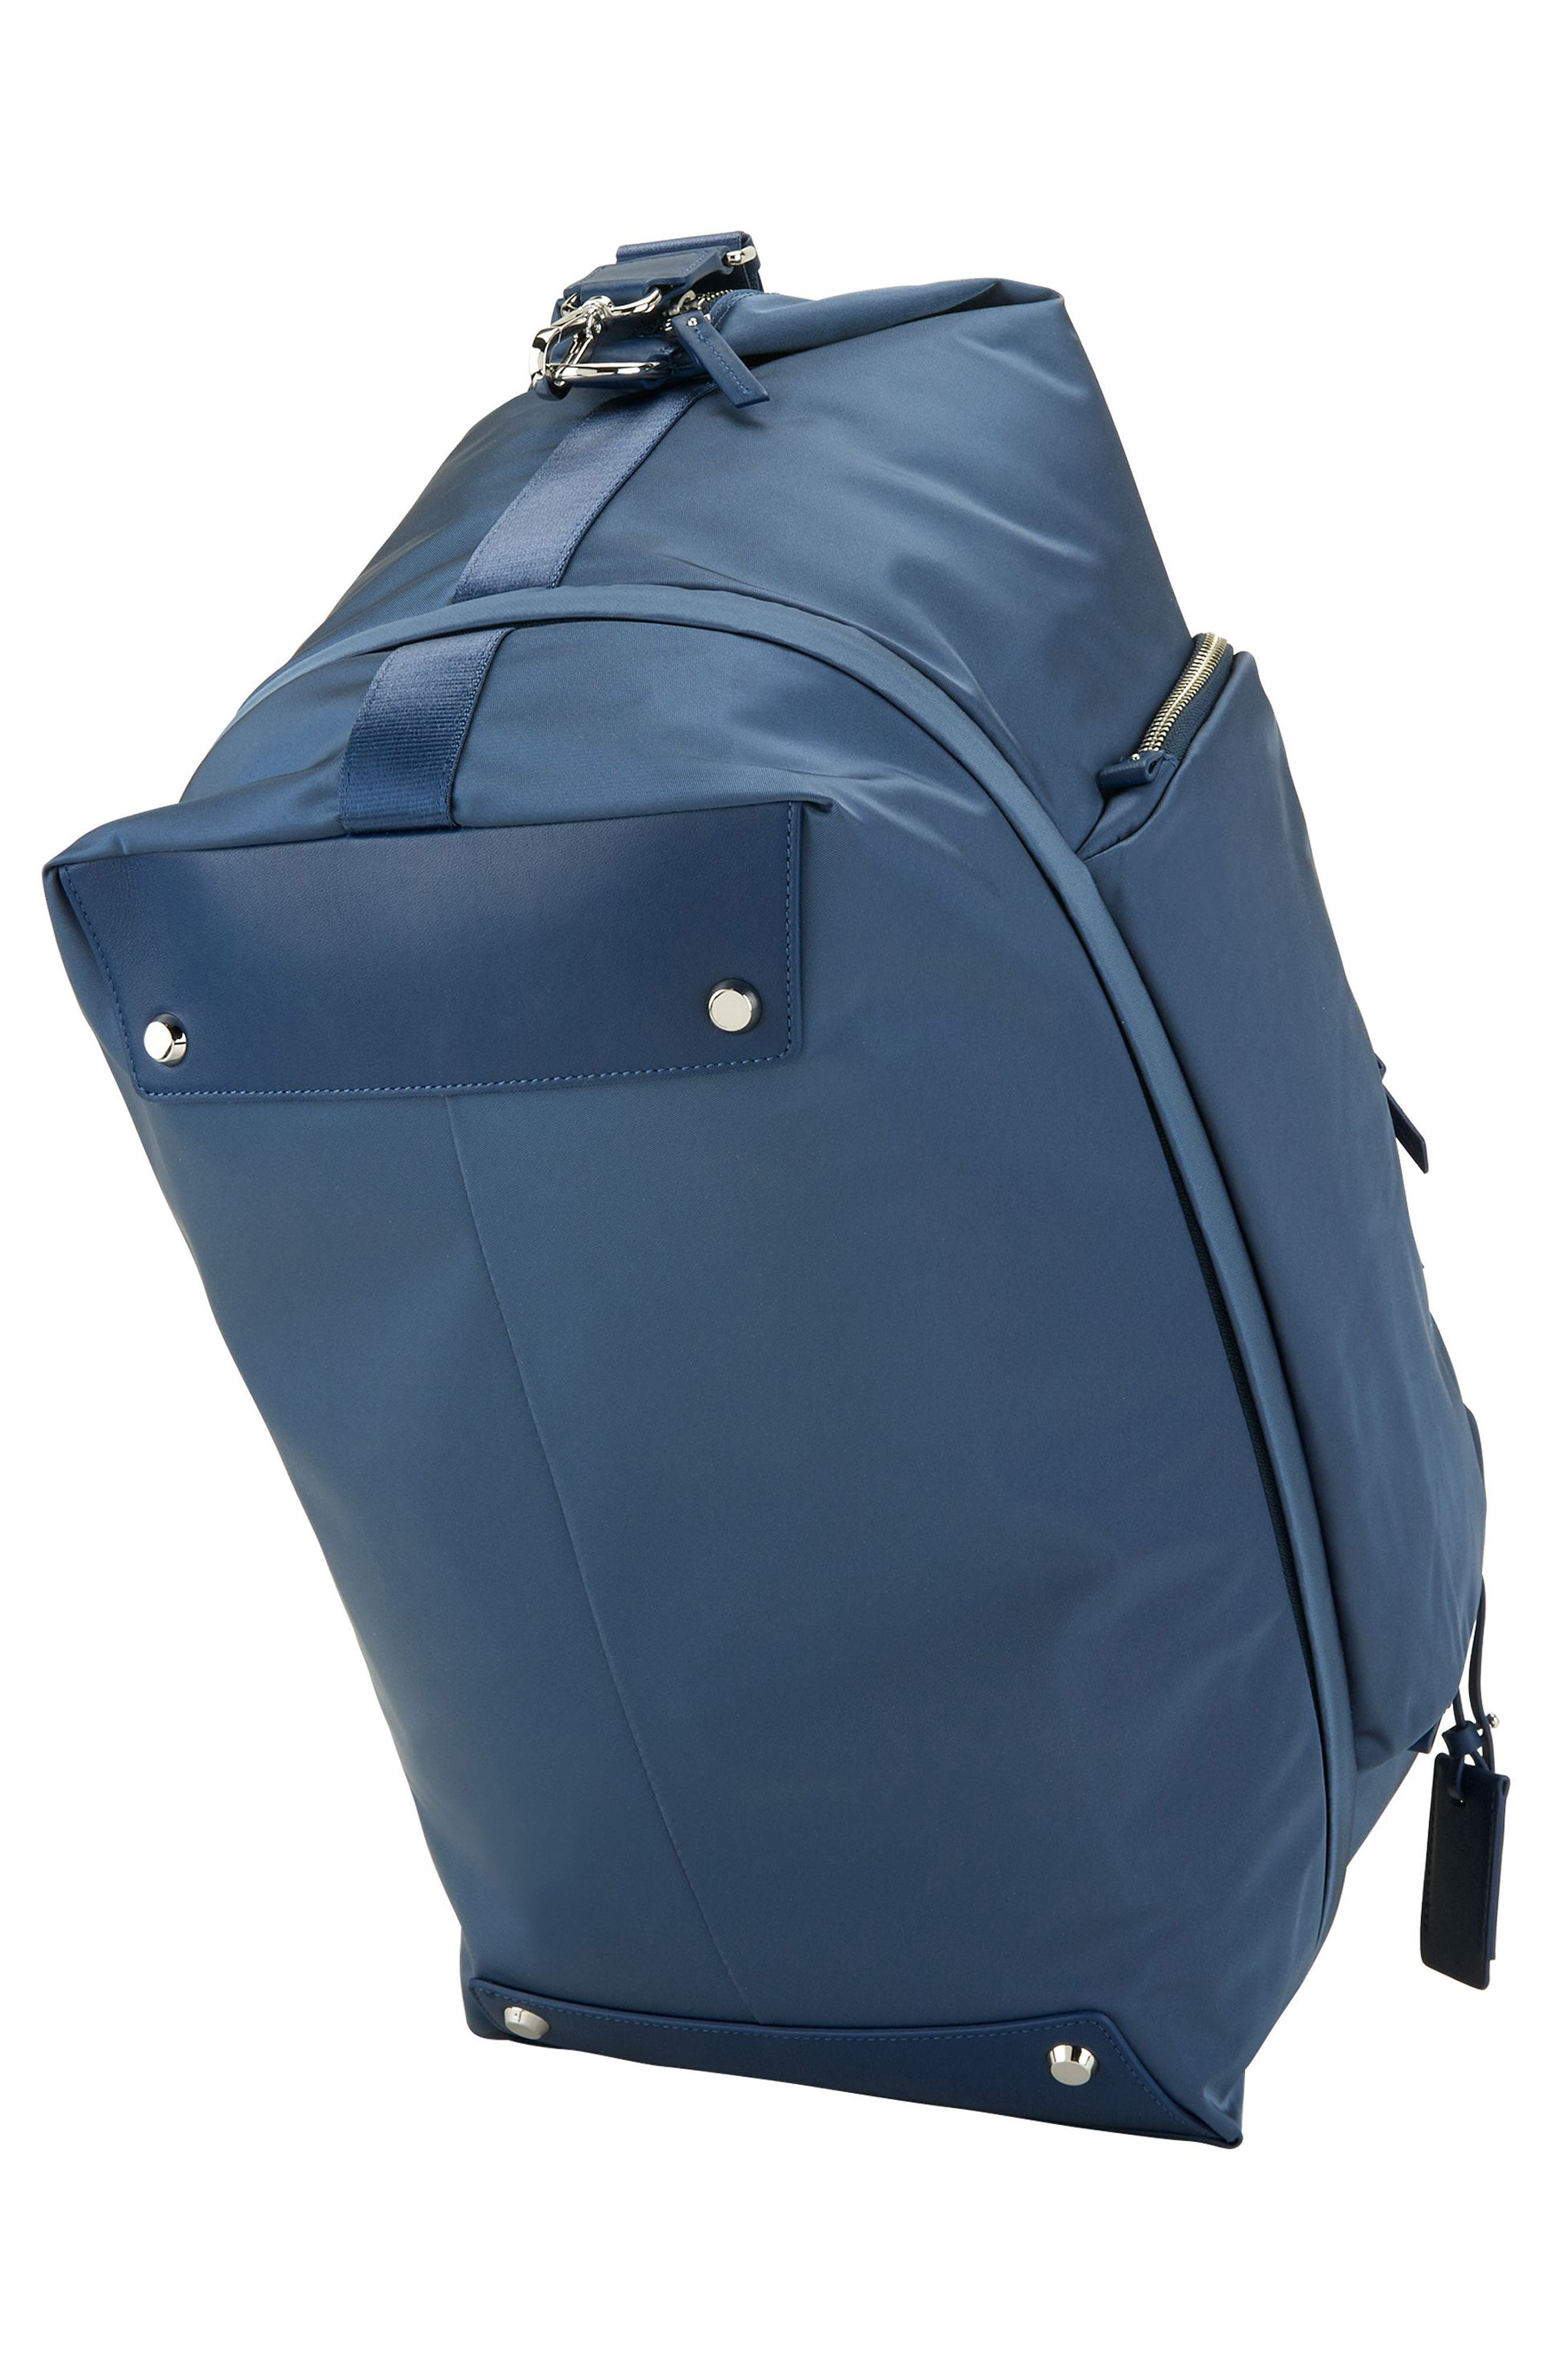 Durban Expandable Duffel Bag,                             Alternate thumbnail 8, color,